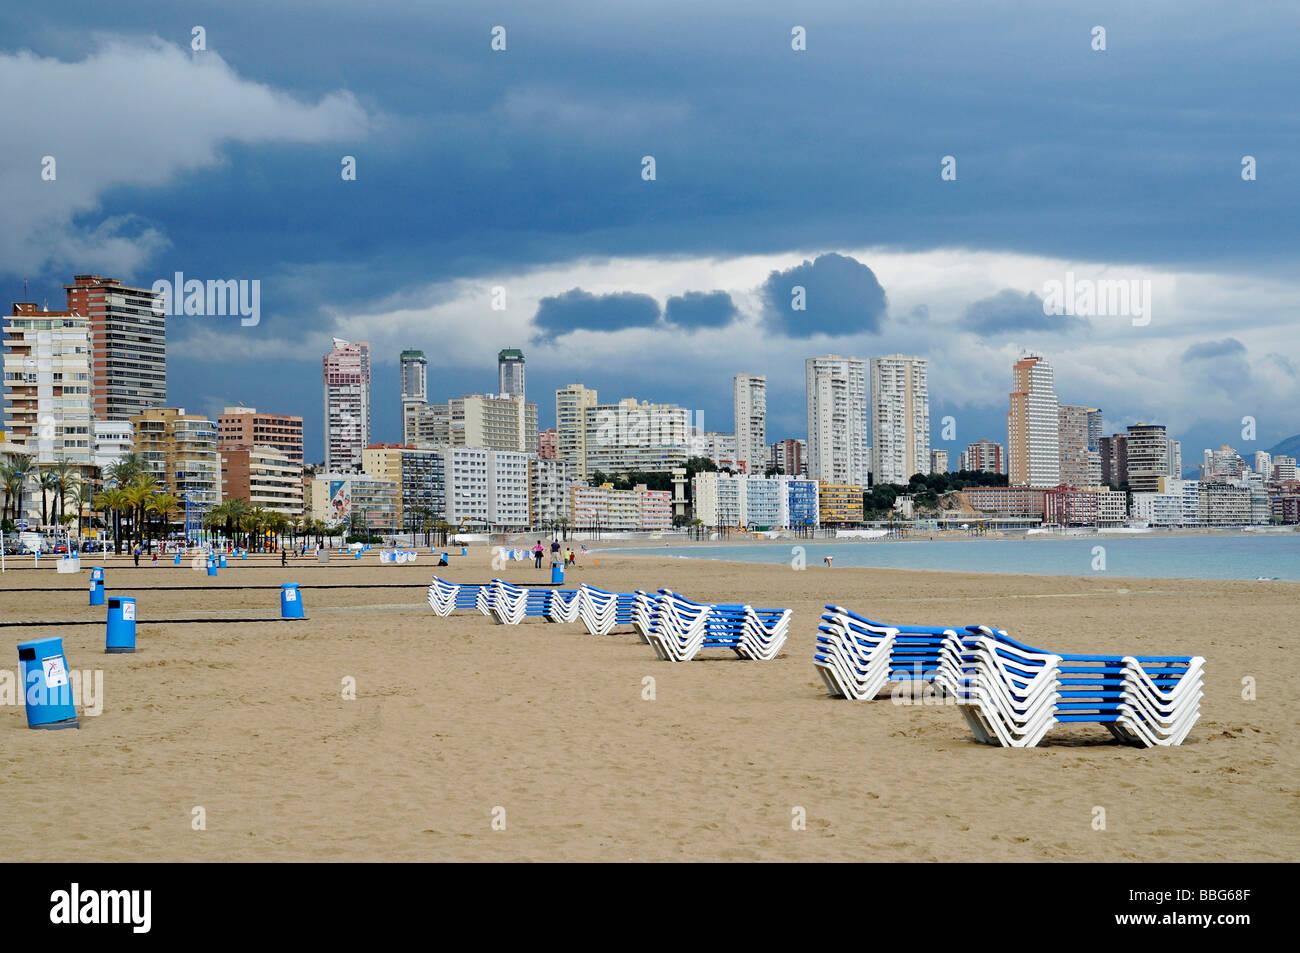 Empty beach, deck chairs, dark clouds, bad weather, crisis, Playa de Poniente, Ponent, beach, Benidorm, Costa Blanca, Stock Photo